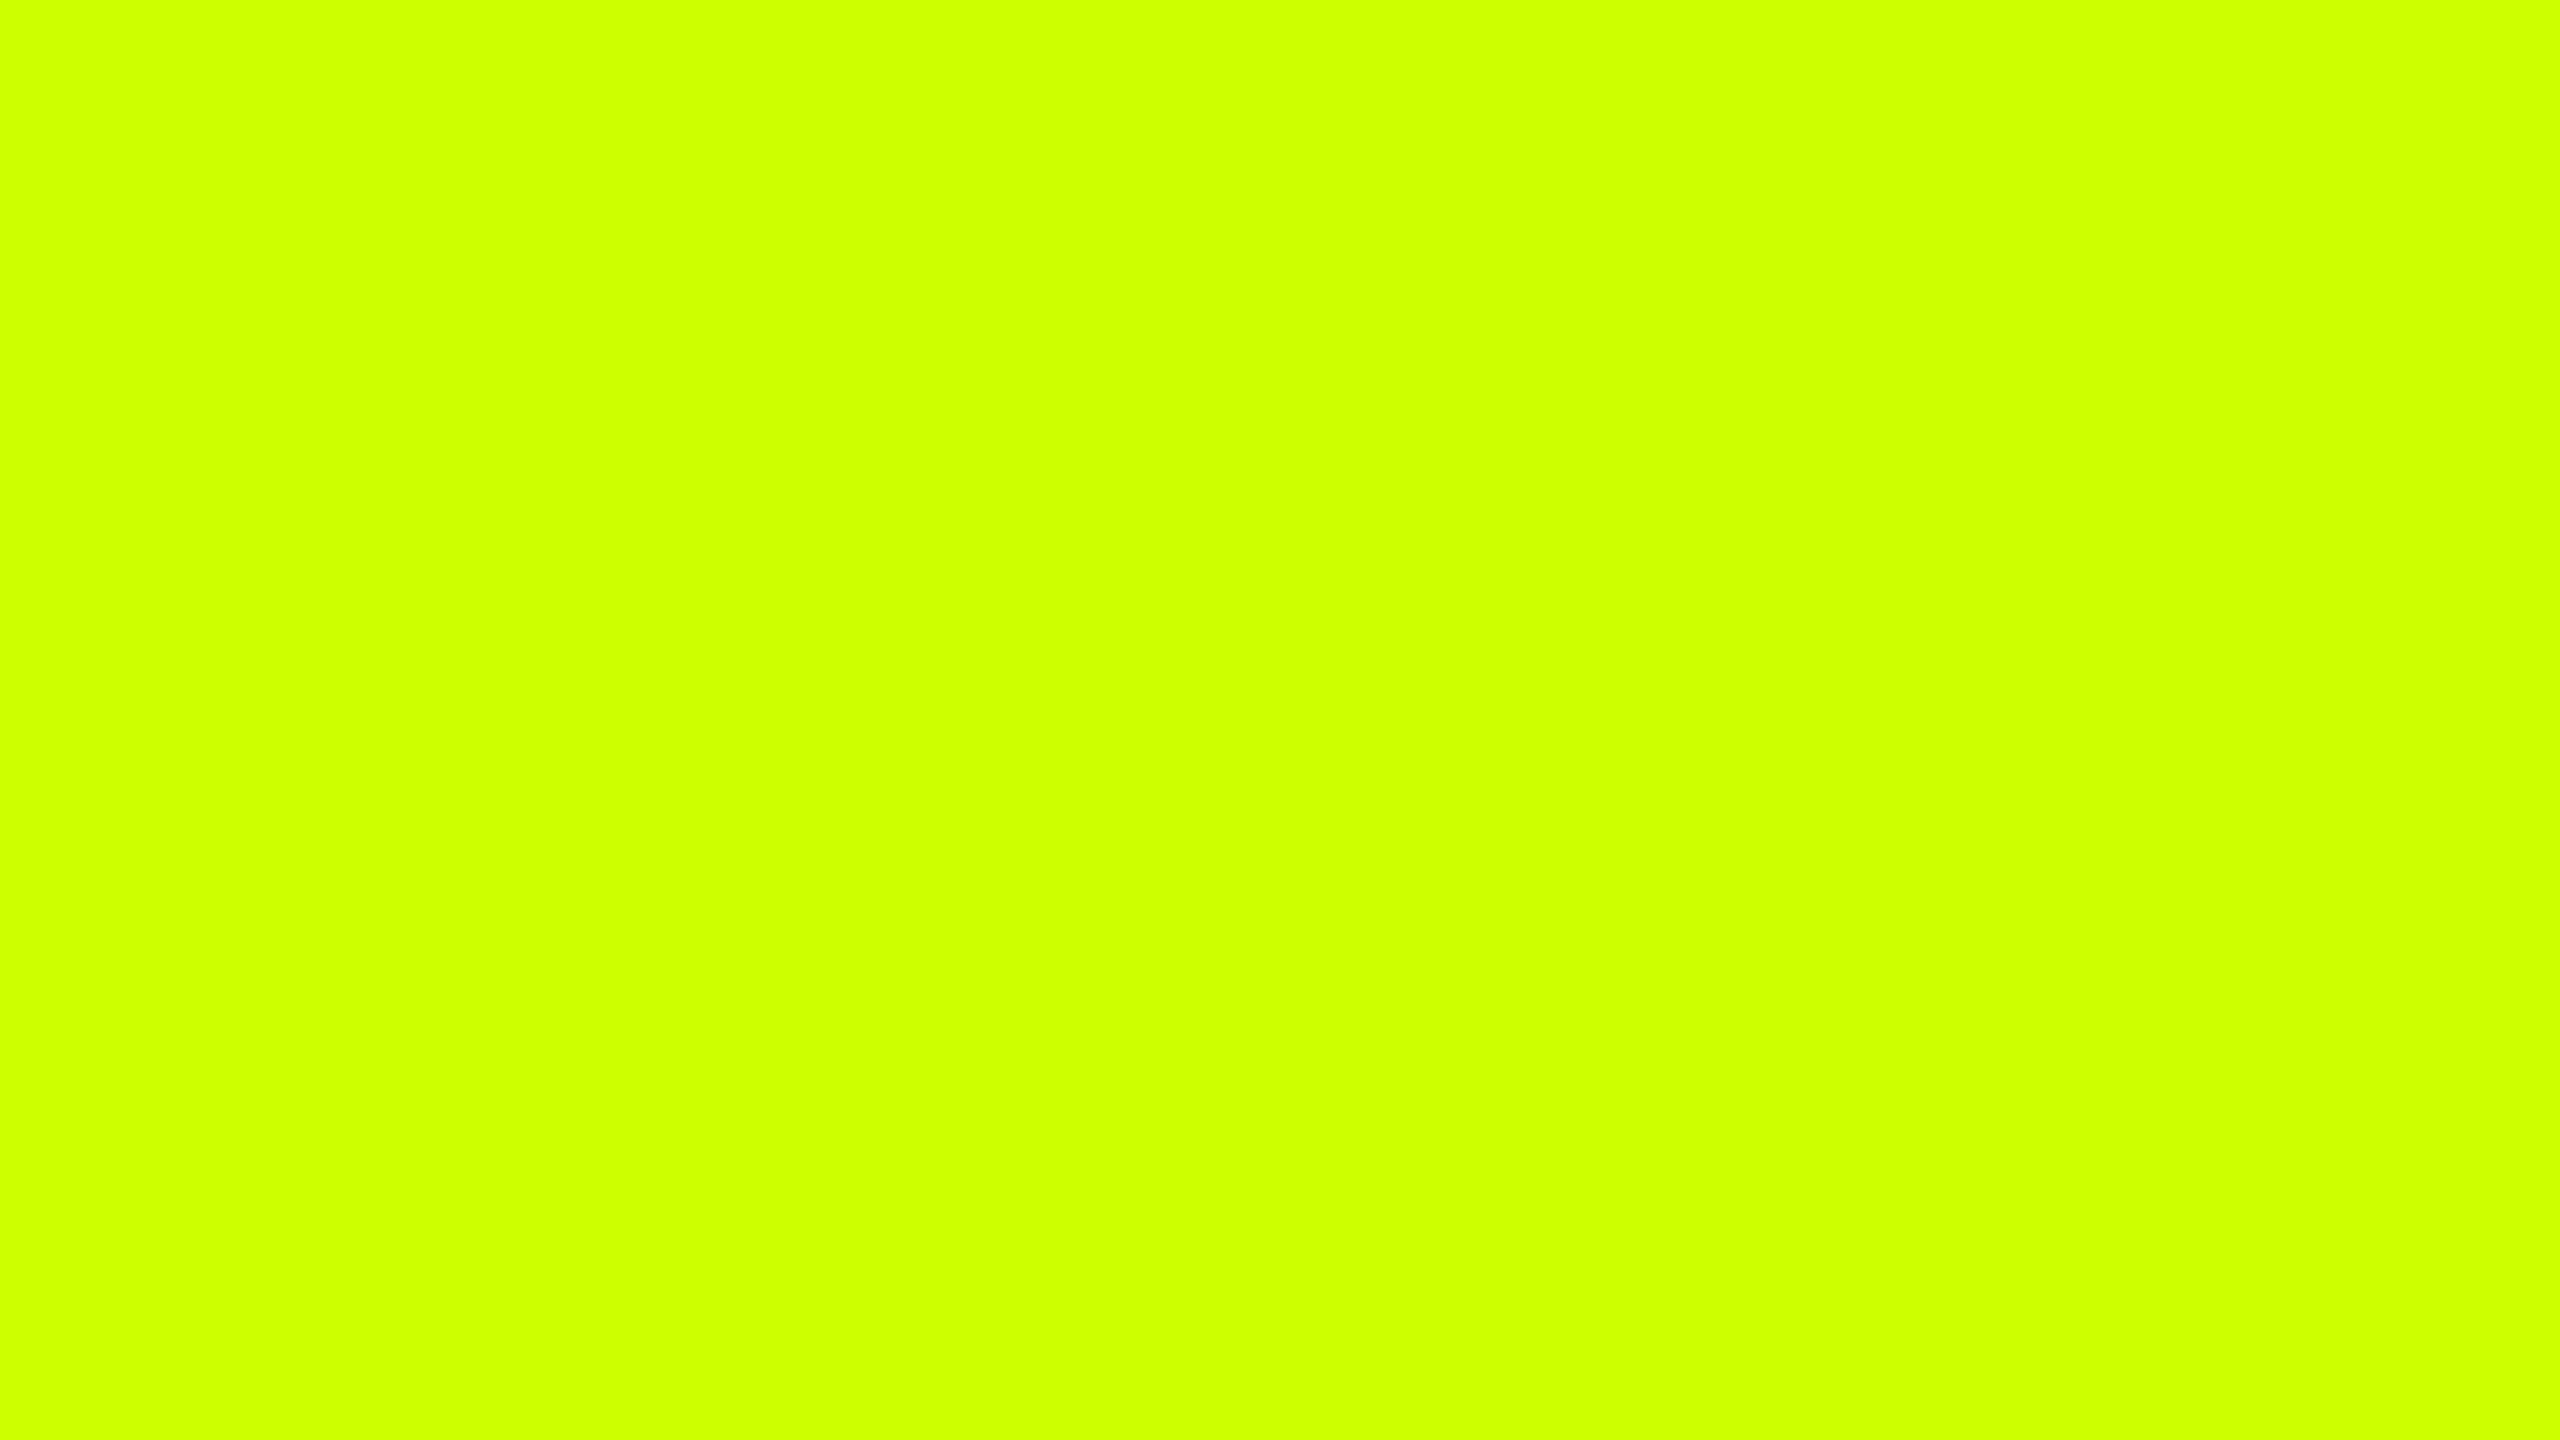 76+ Yellow Colour Wallpaper on WallpaperSafari